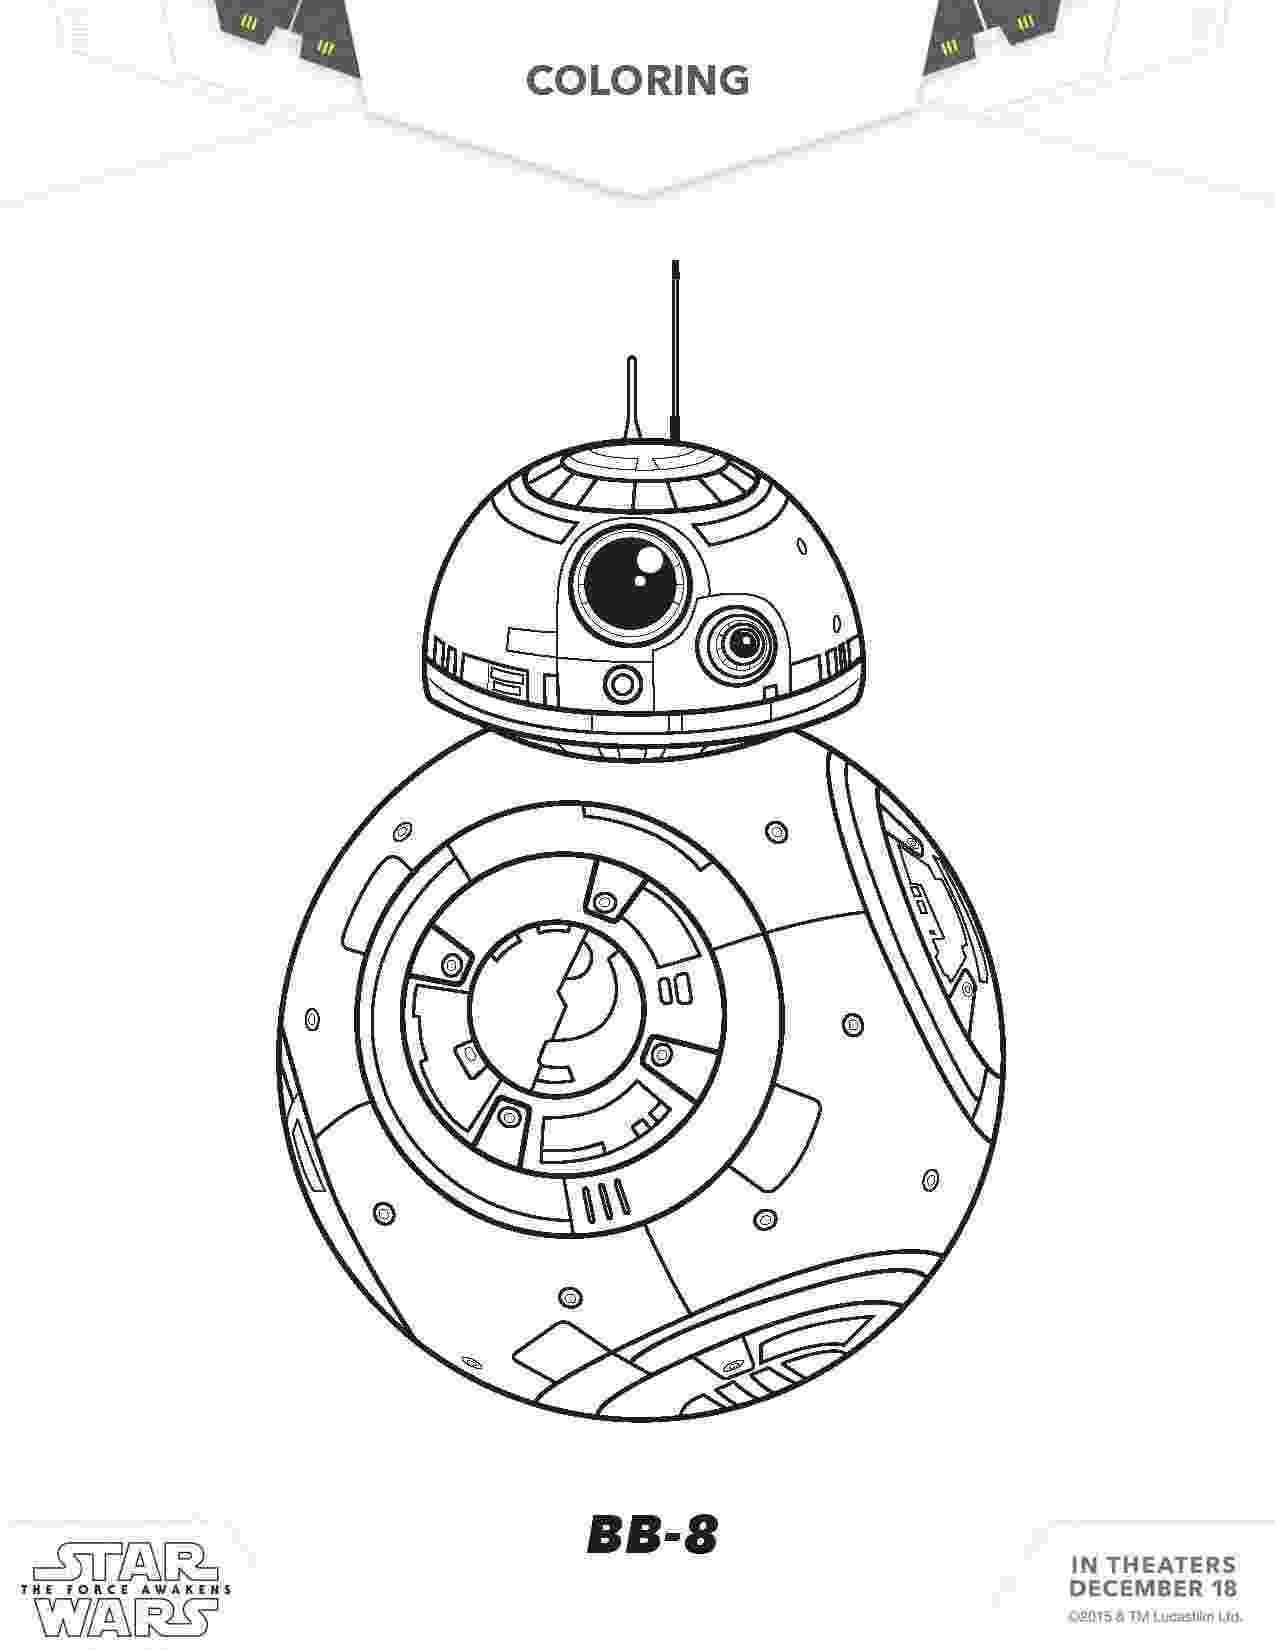 star wars coloring book pdf star wars coloring pages the force awakens coloring pages coloring pdf wars star book